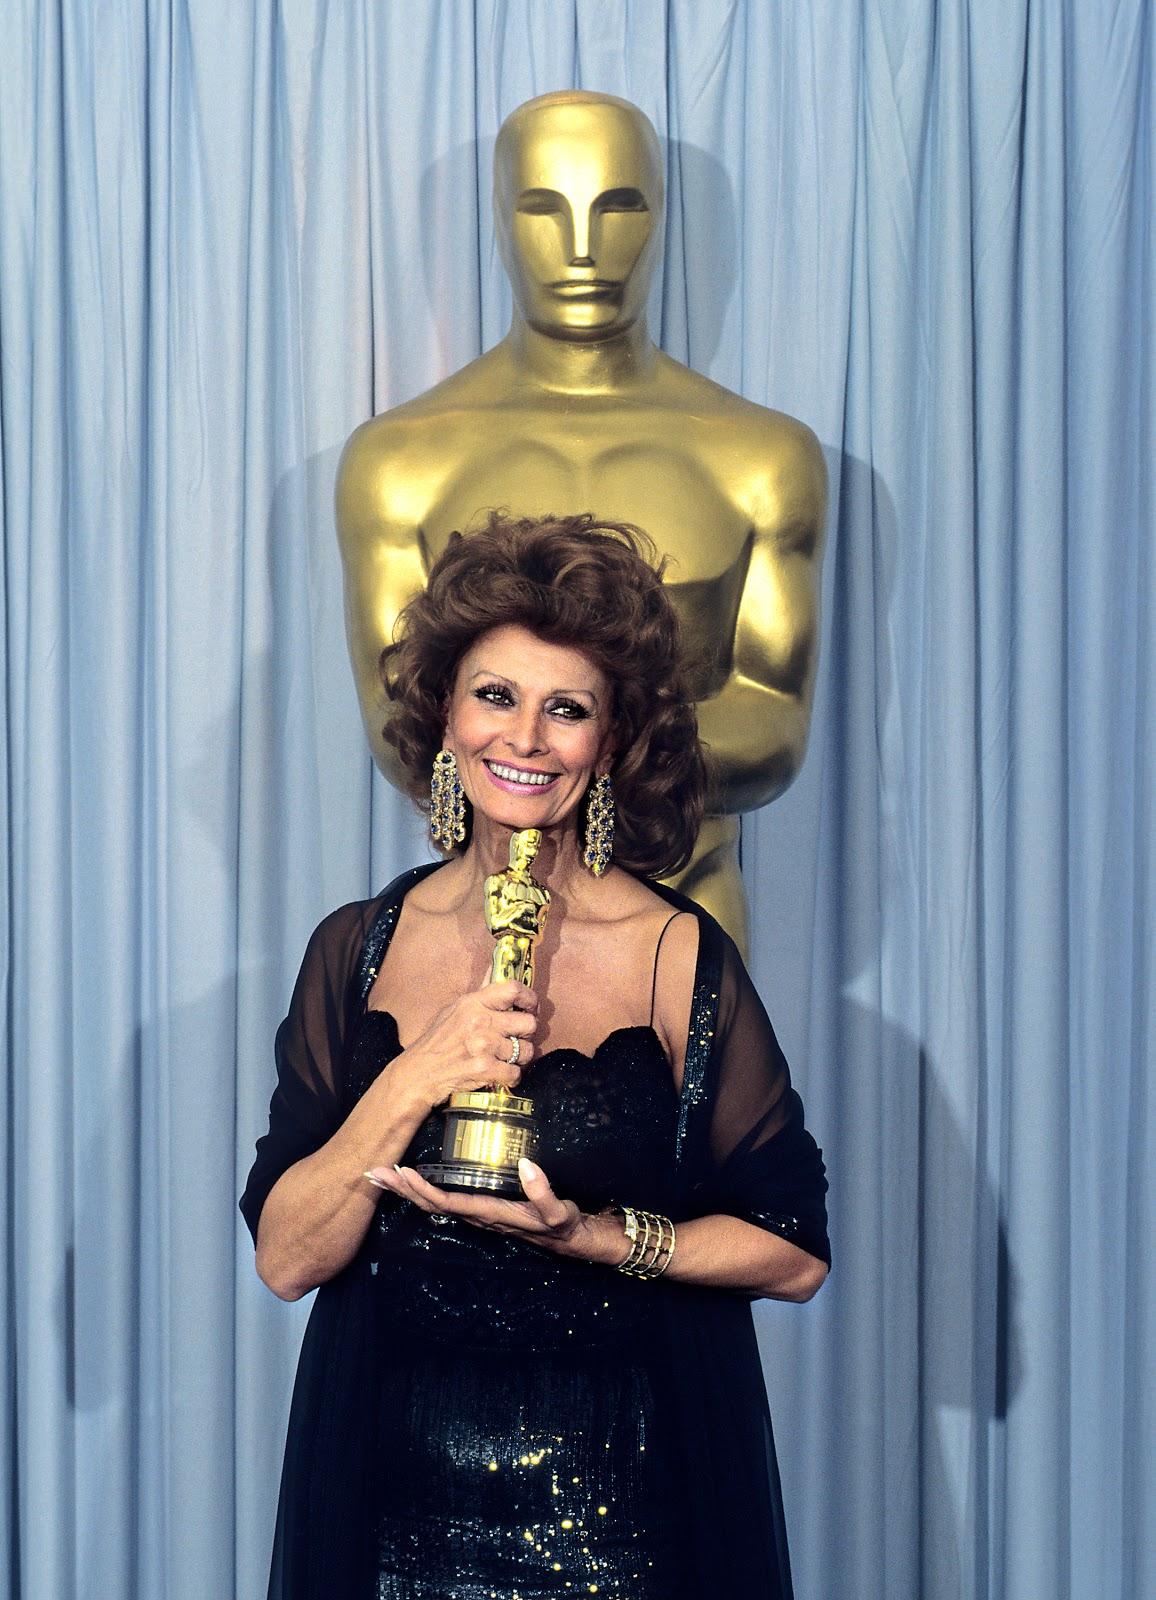 http://4.bp.blogspot.com/-TA9EH1O-Ez8/TZE9IL1c5rI/AAAAAAAAAQ0/gJxoYfyw02I/s1600/Sophia+Loren+at+the+1990+%252863rd%2529+Academy+Award+ceremony+01.jpg